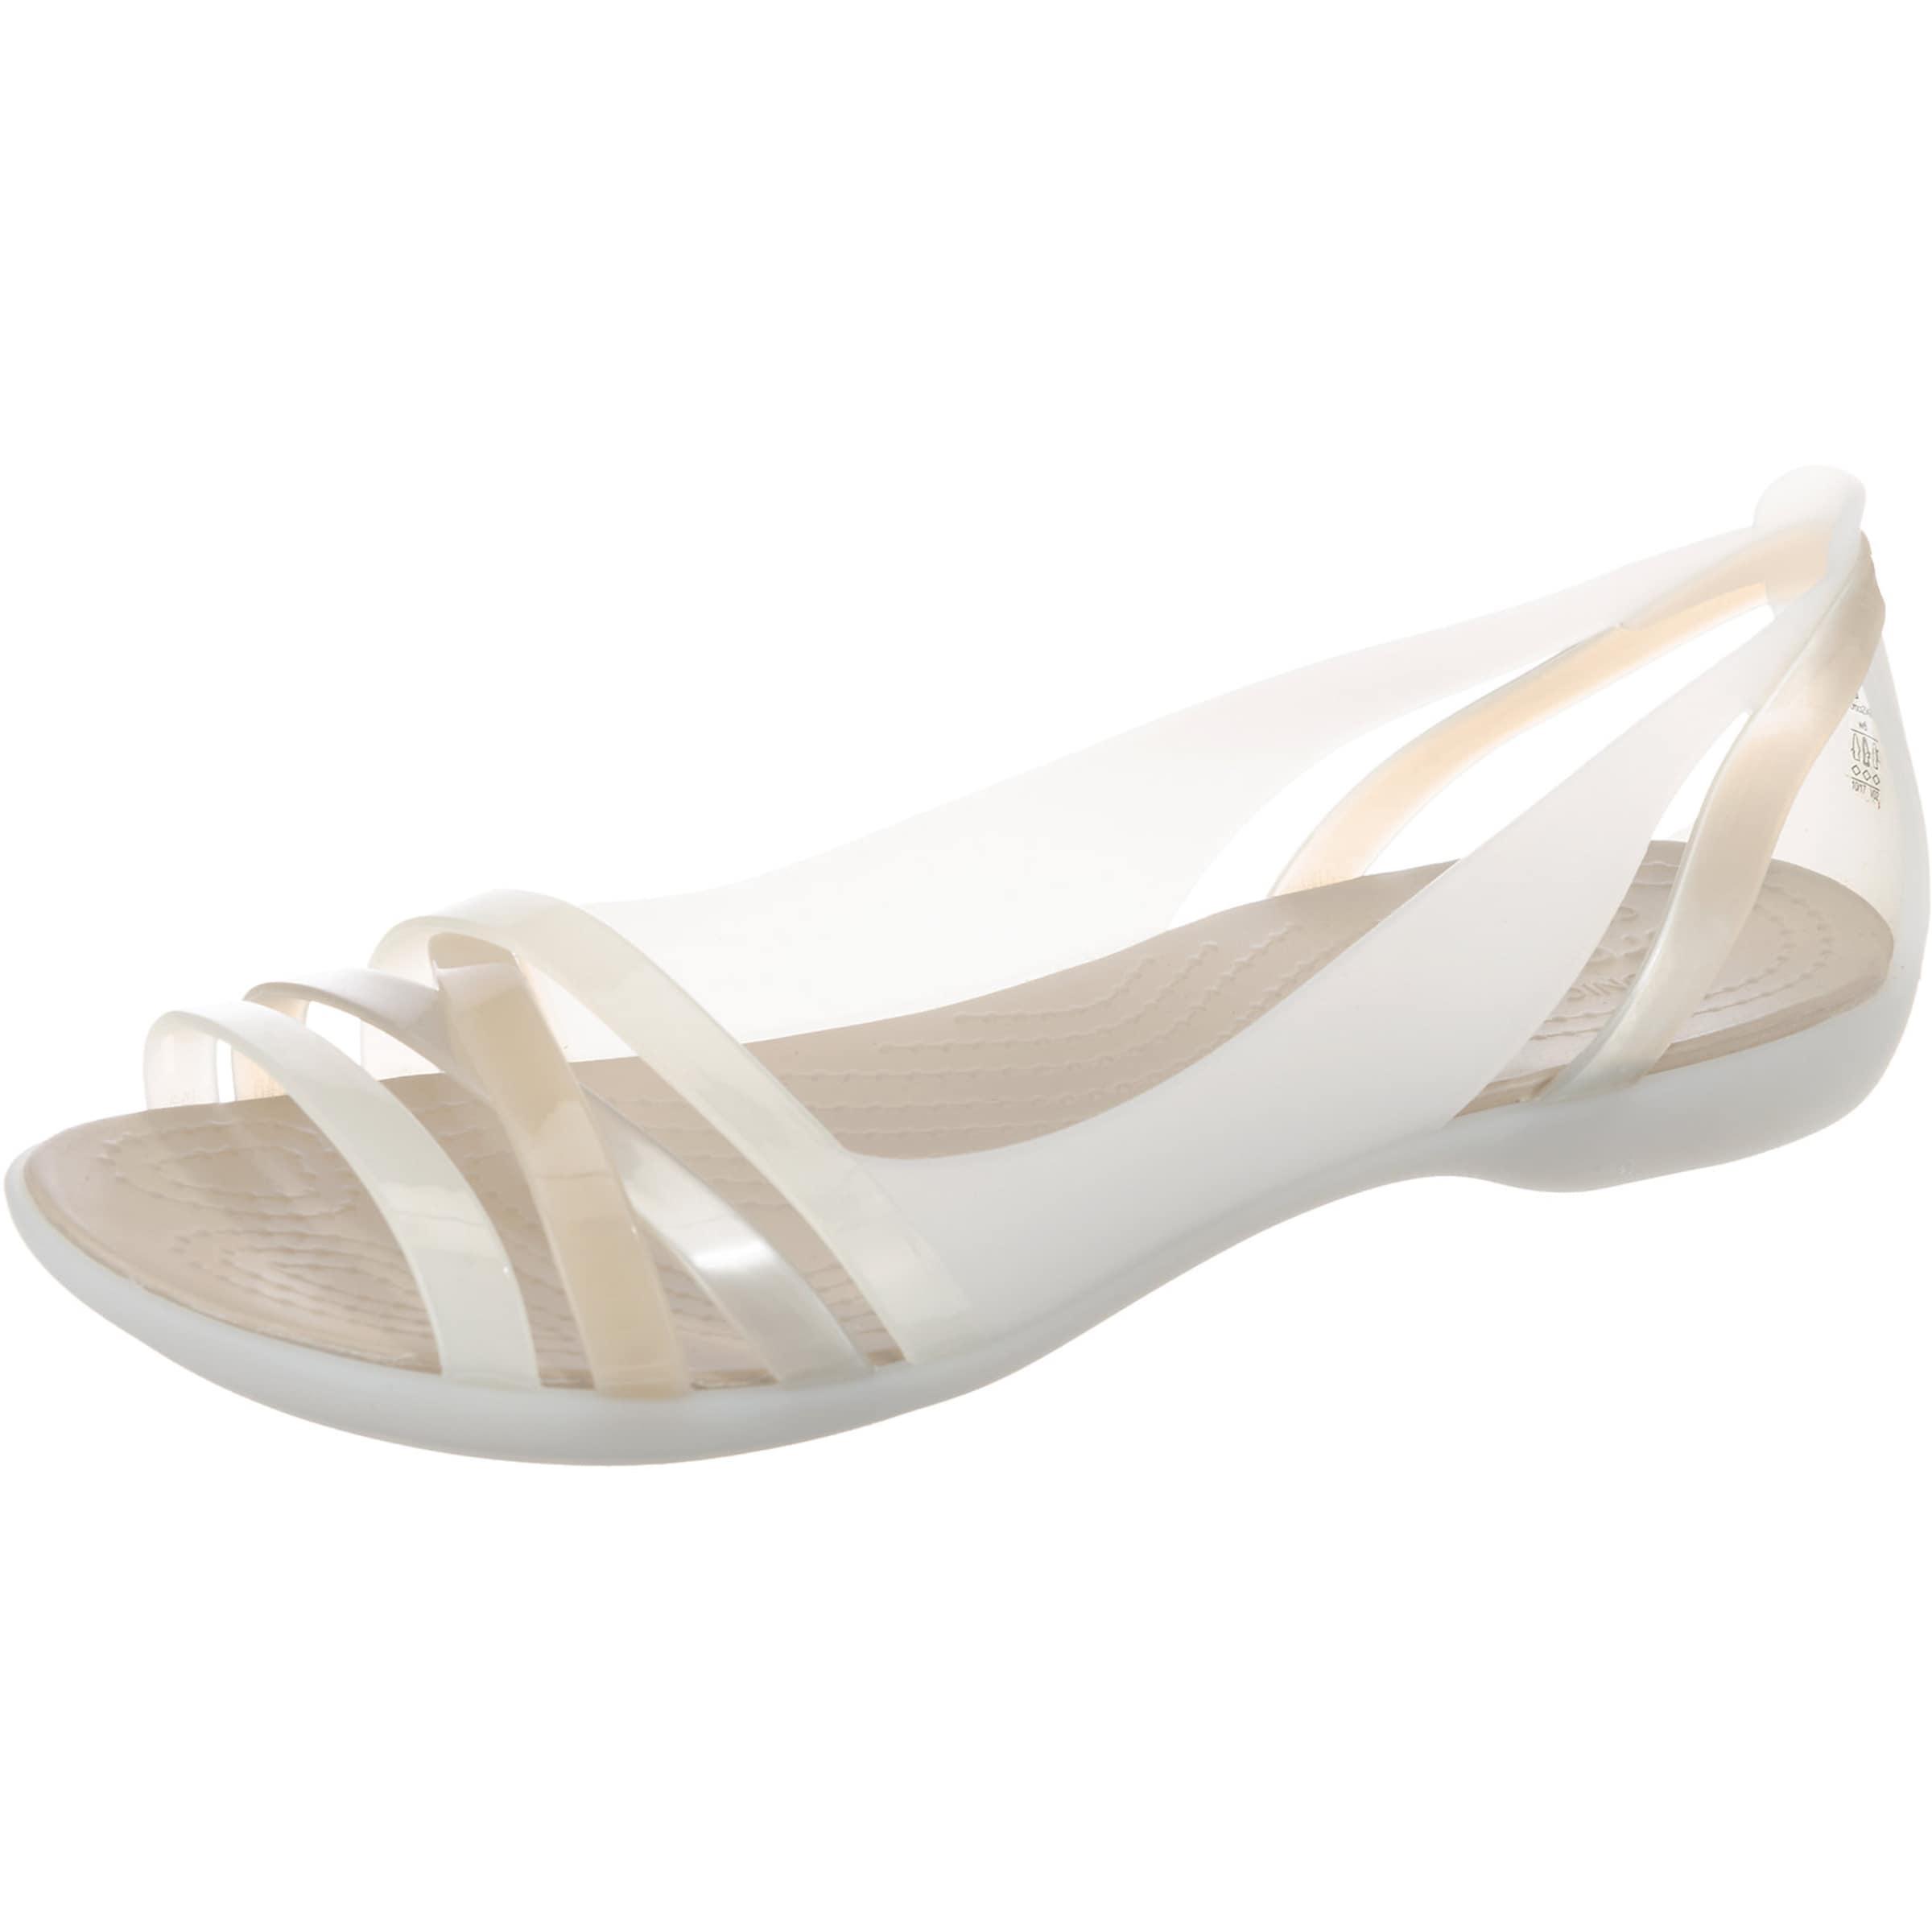 Crocs Isabella Huarache 2 Flat W Klassische Ballerinas